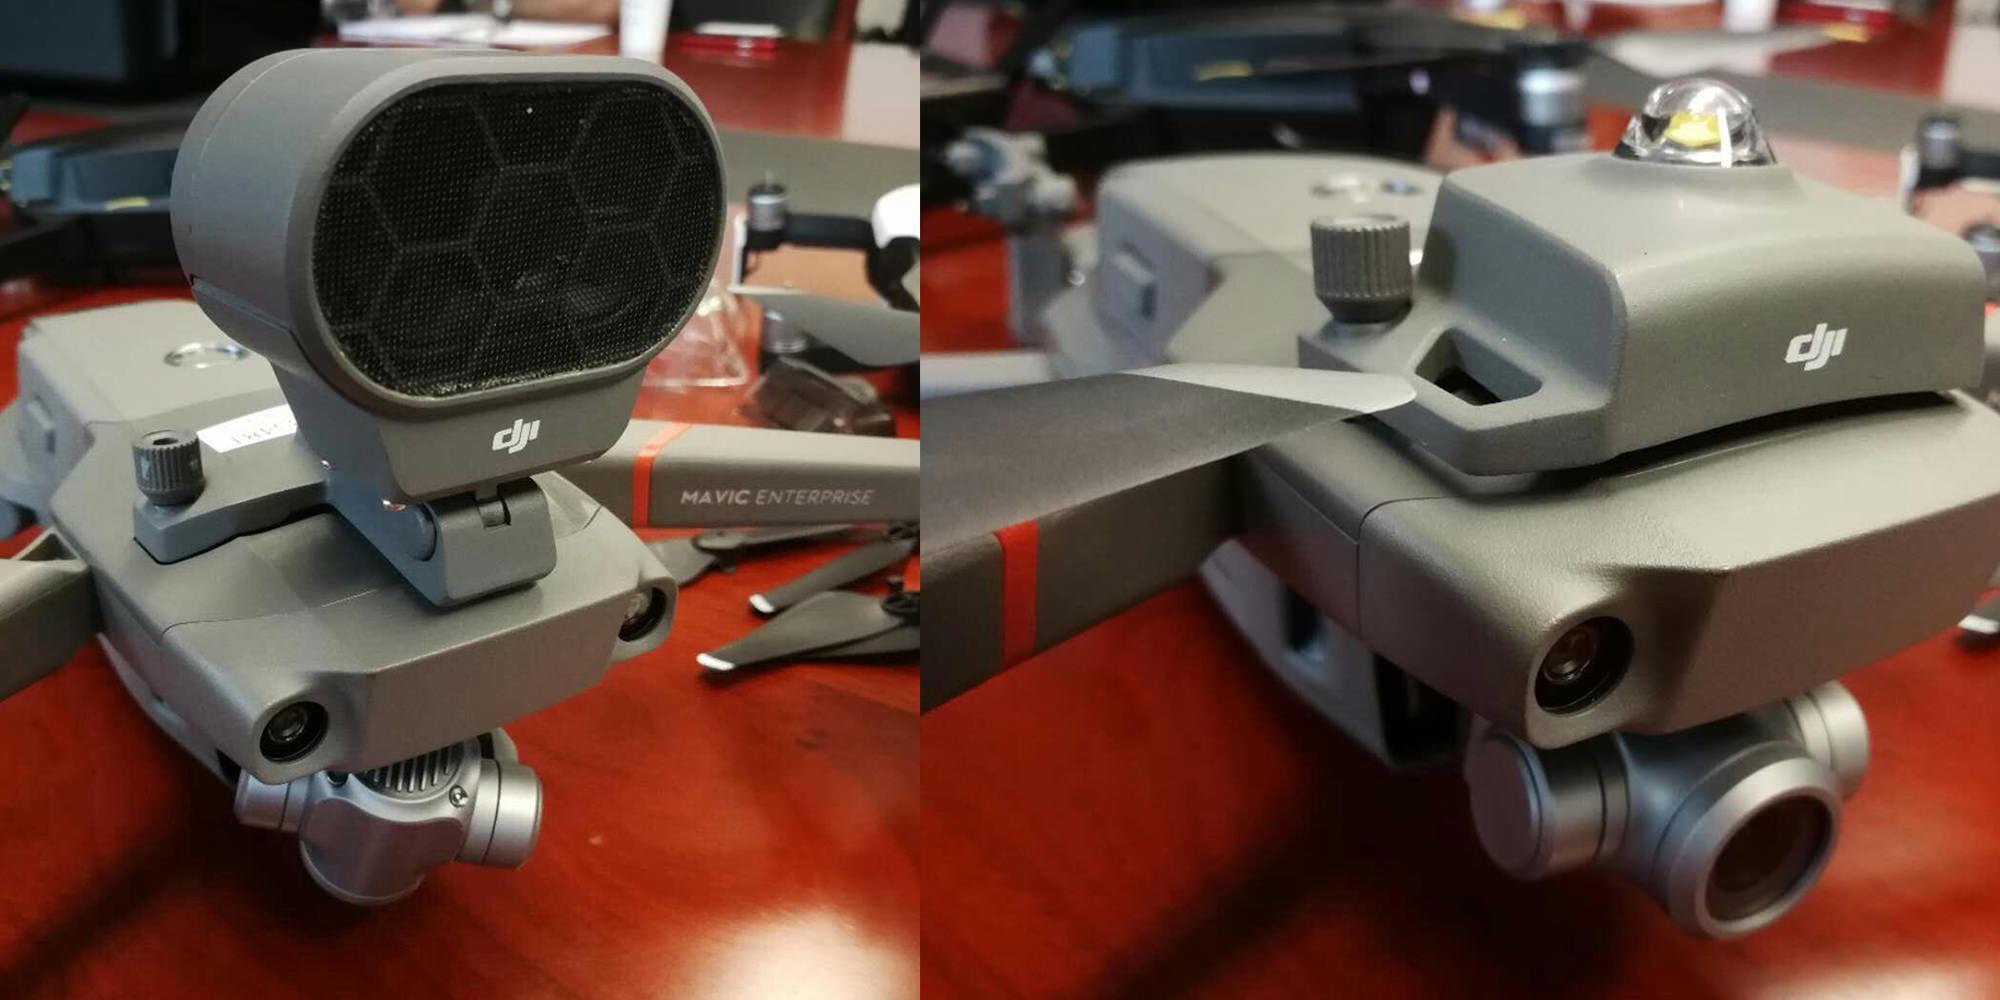 dji-mavicpro2-enterprise-edition-leakedphoto.jpg